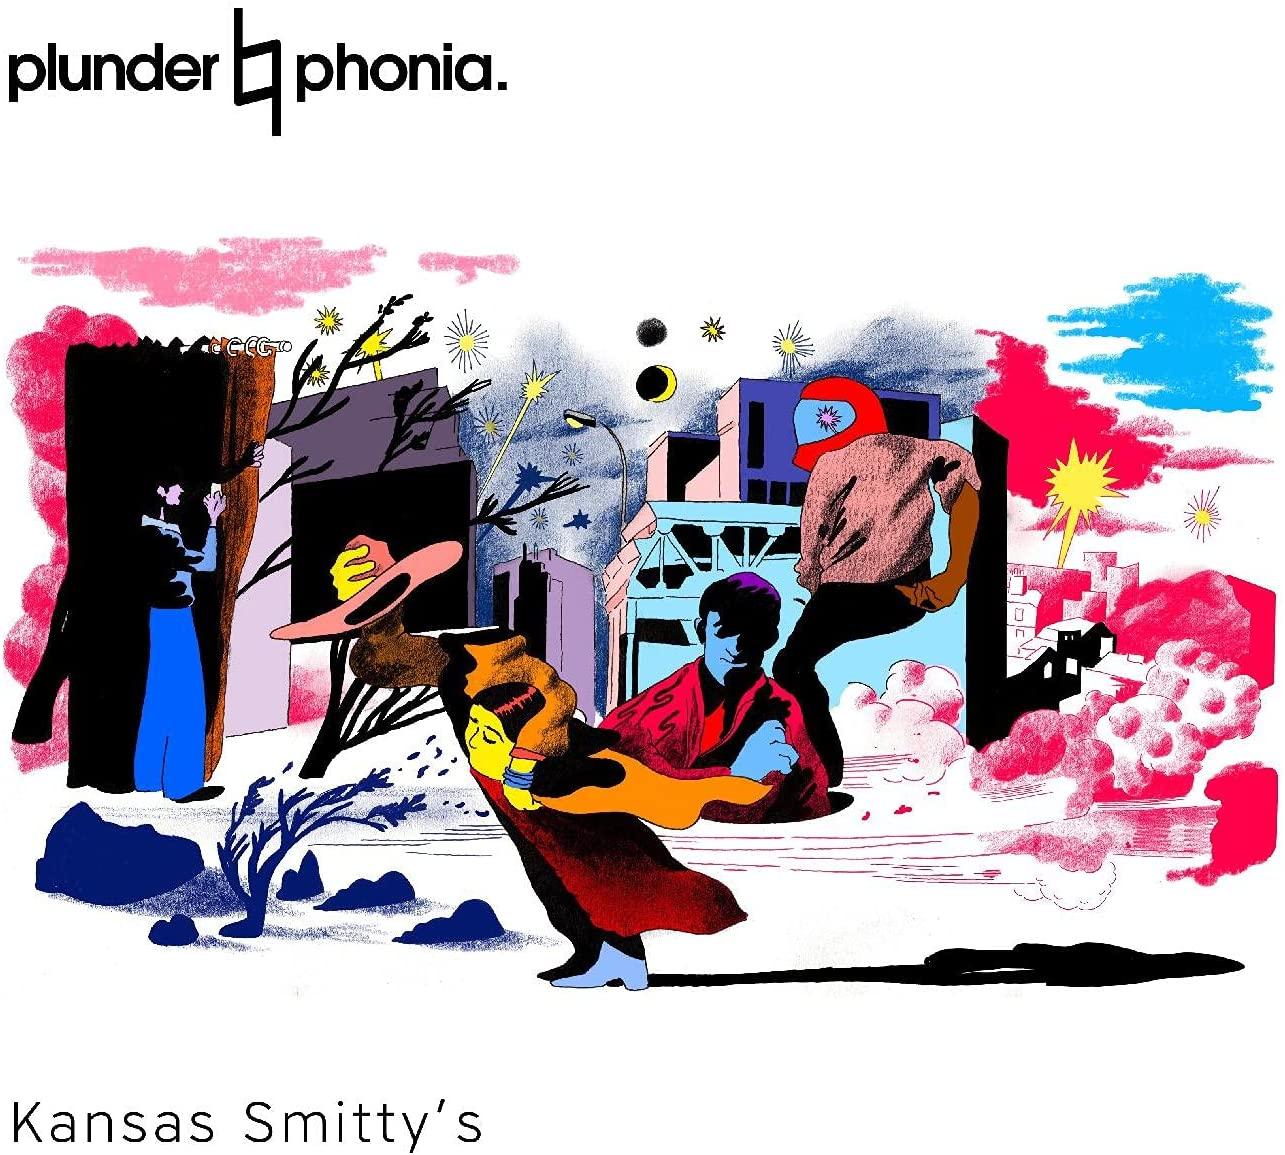 KANSAS SMITTYS - Plunderphonia cover